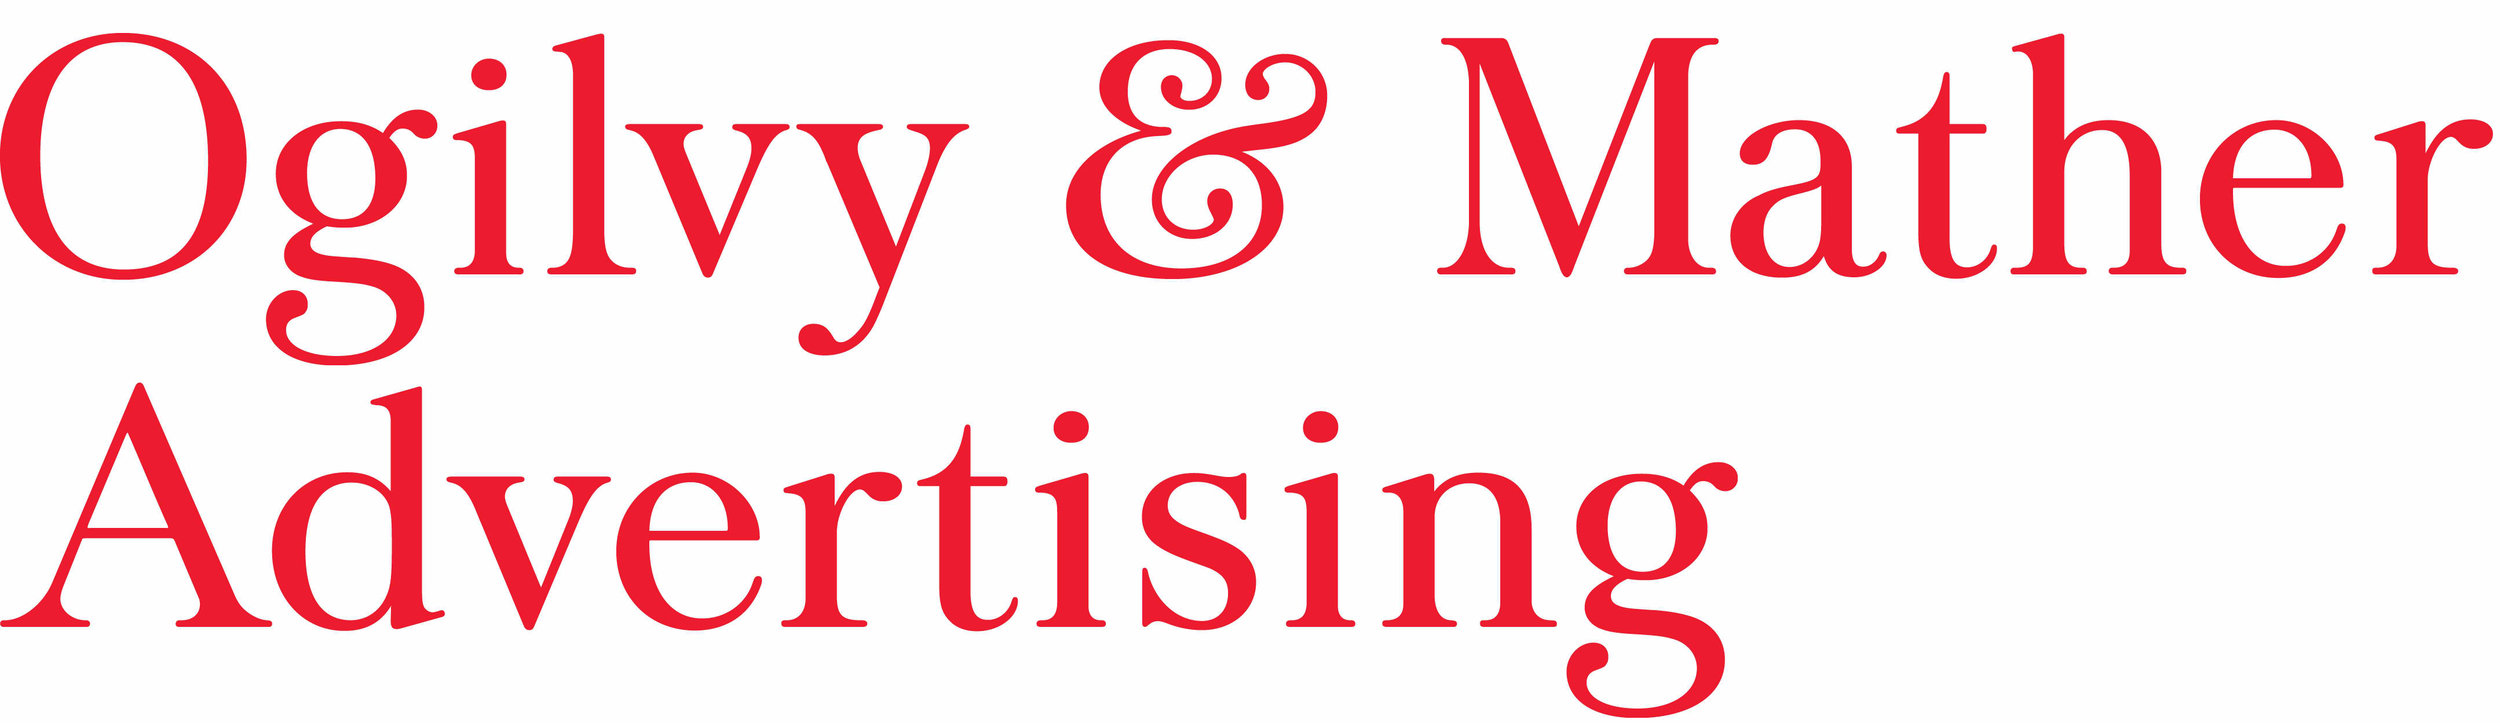 ogilvy-mather-advertising-logo.jpg